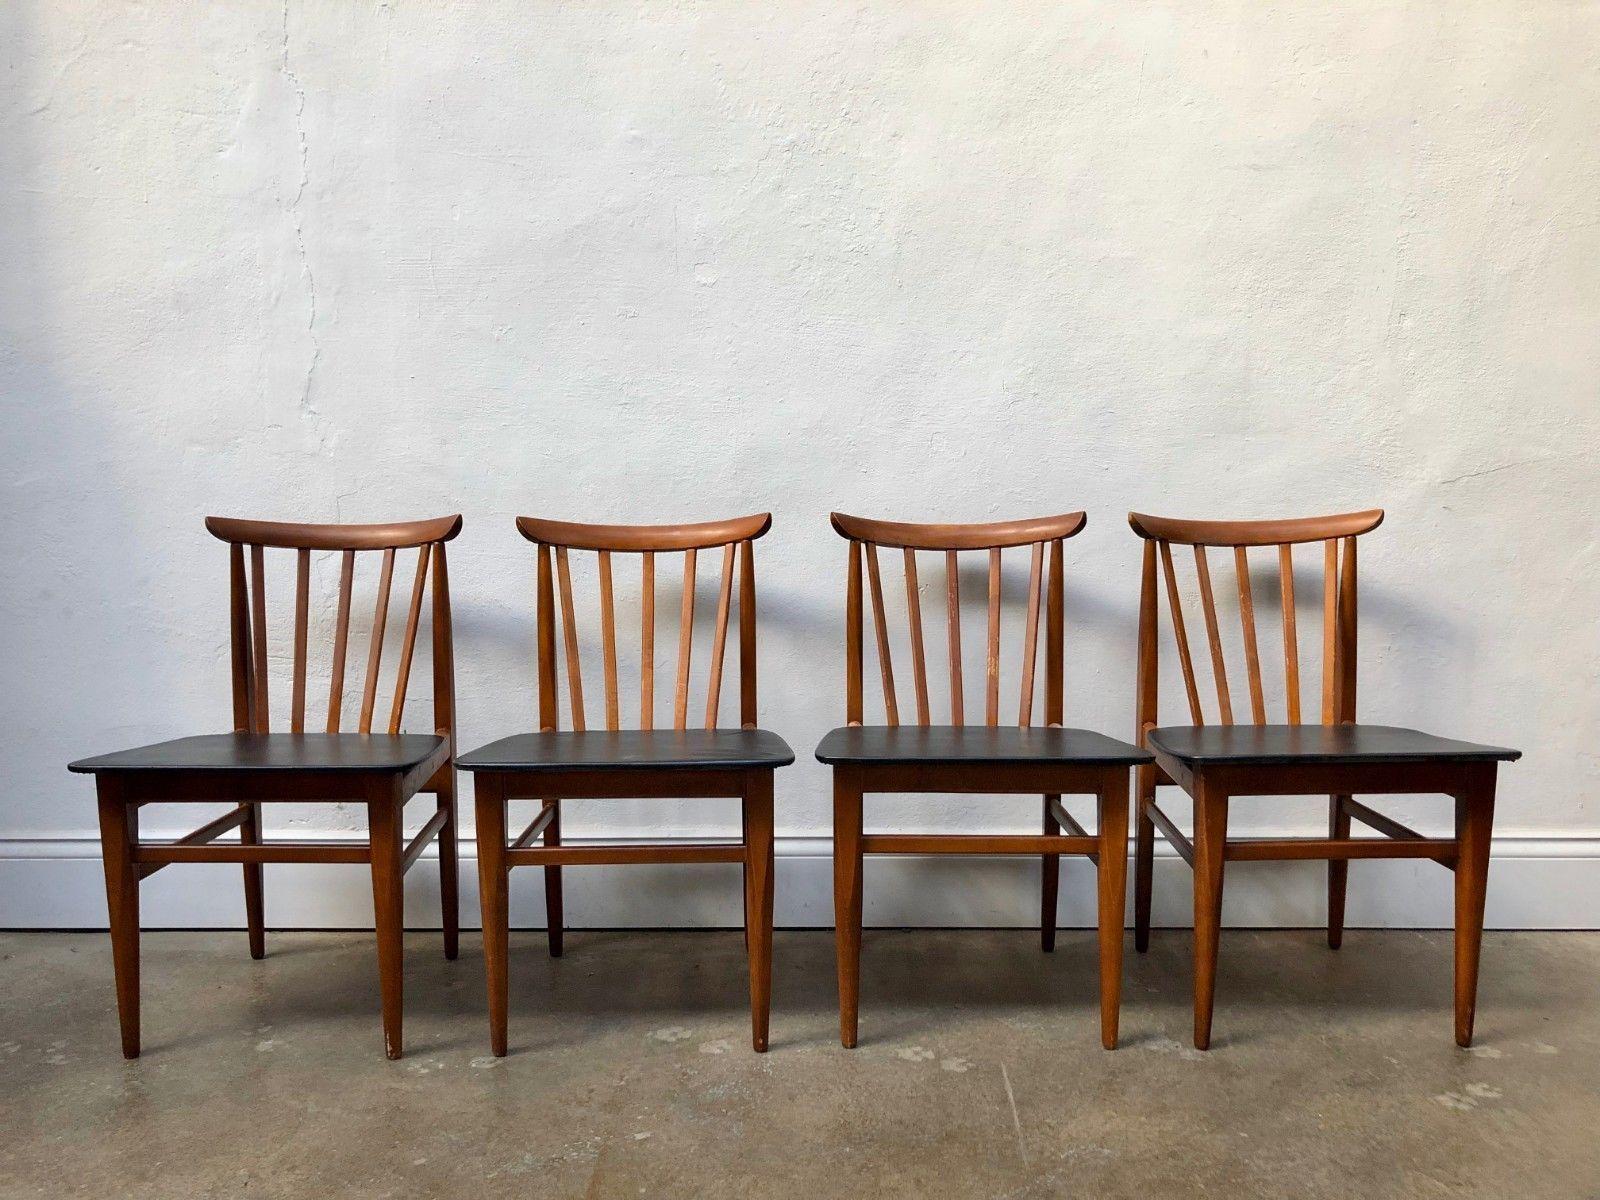 Superb Eon Elliotts Of Newbury Teak Dining Chairs G Plan Danish Retro Pabps2019 Chair Design Images Pabps2019Com